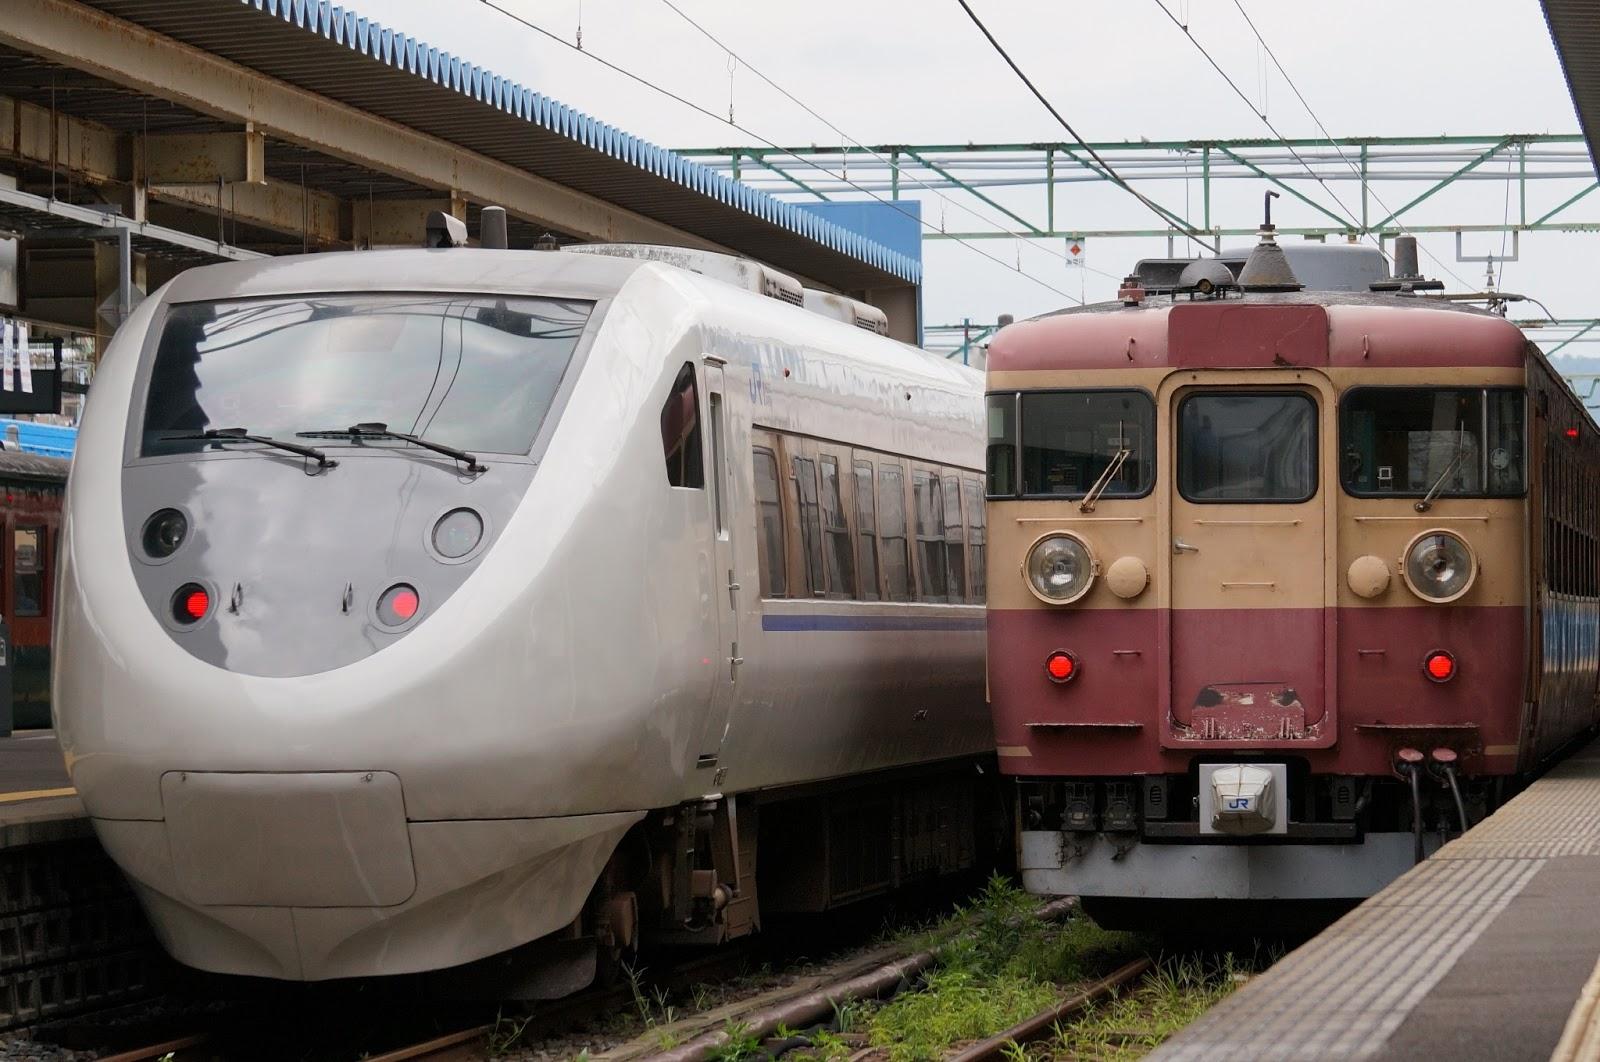 北陸本線直江津駅停車中の681系と475系